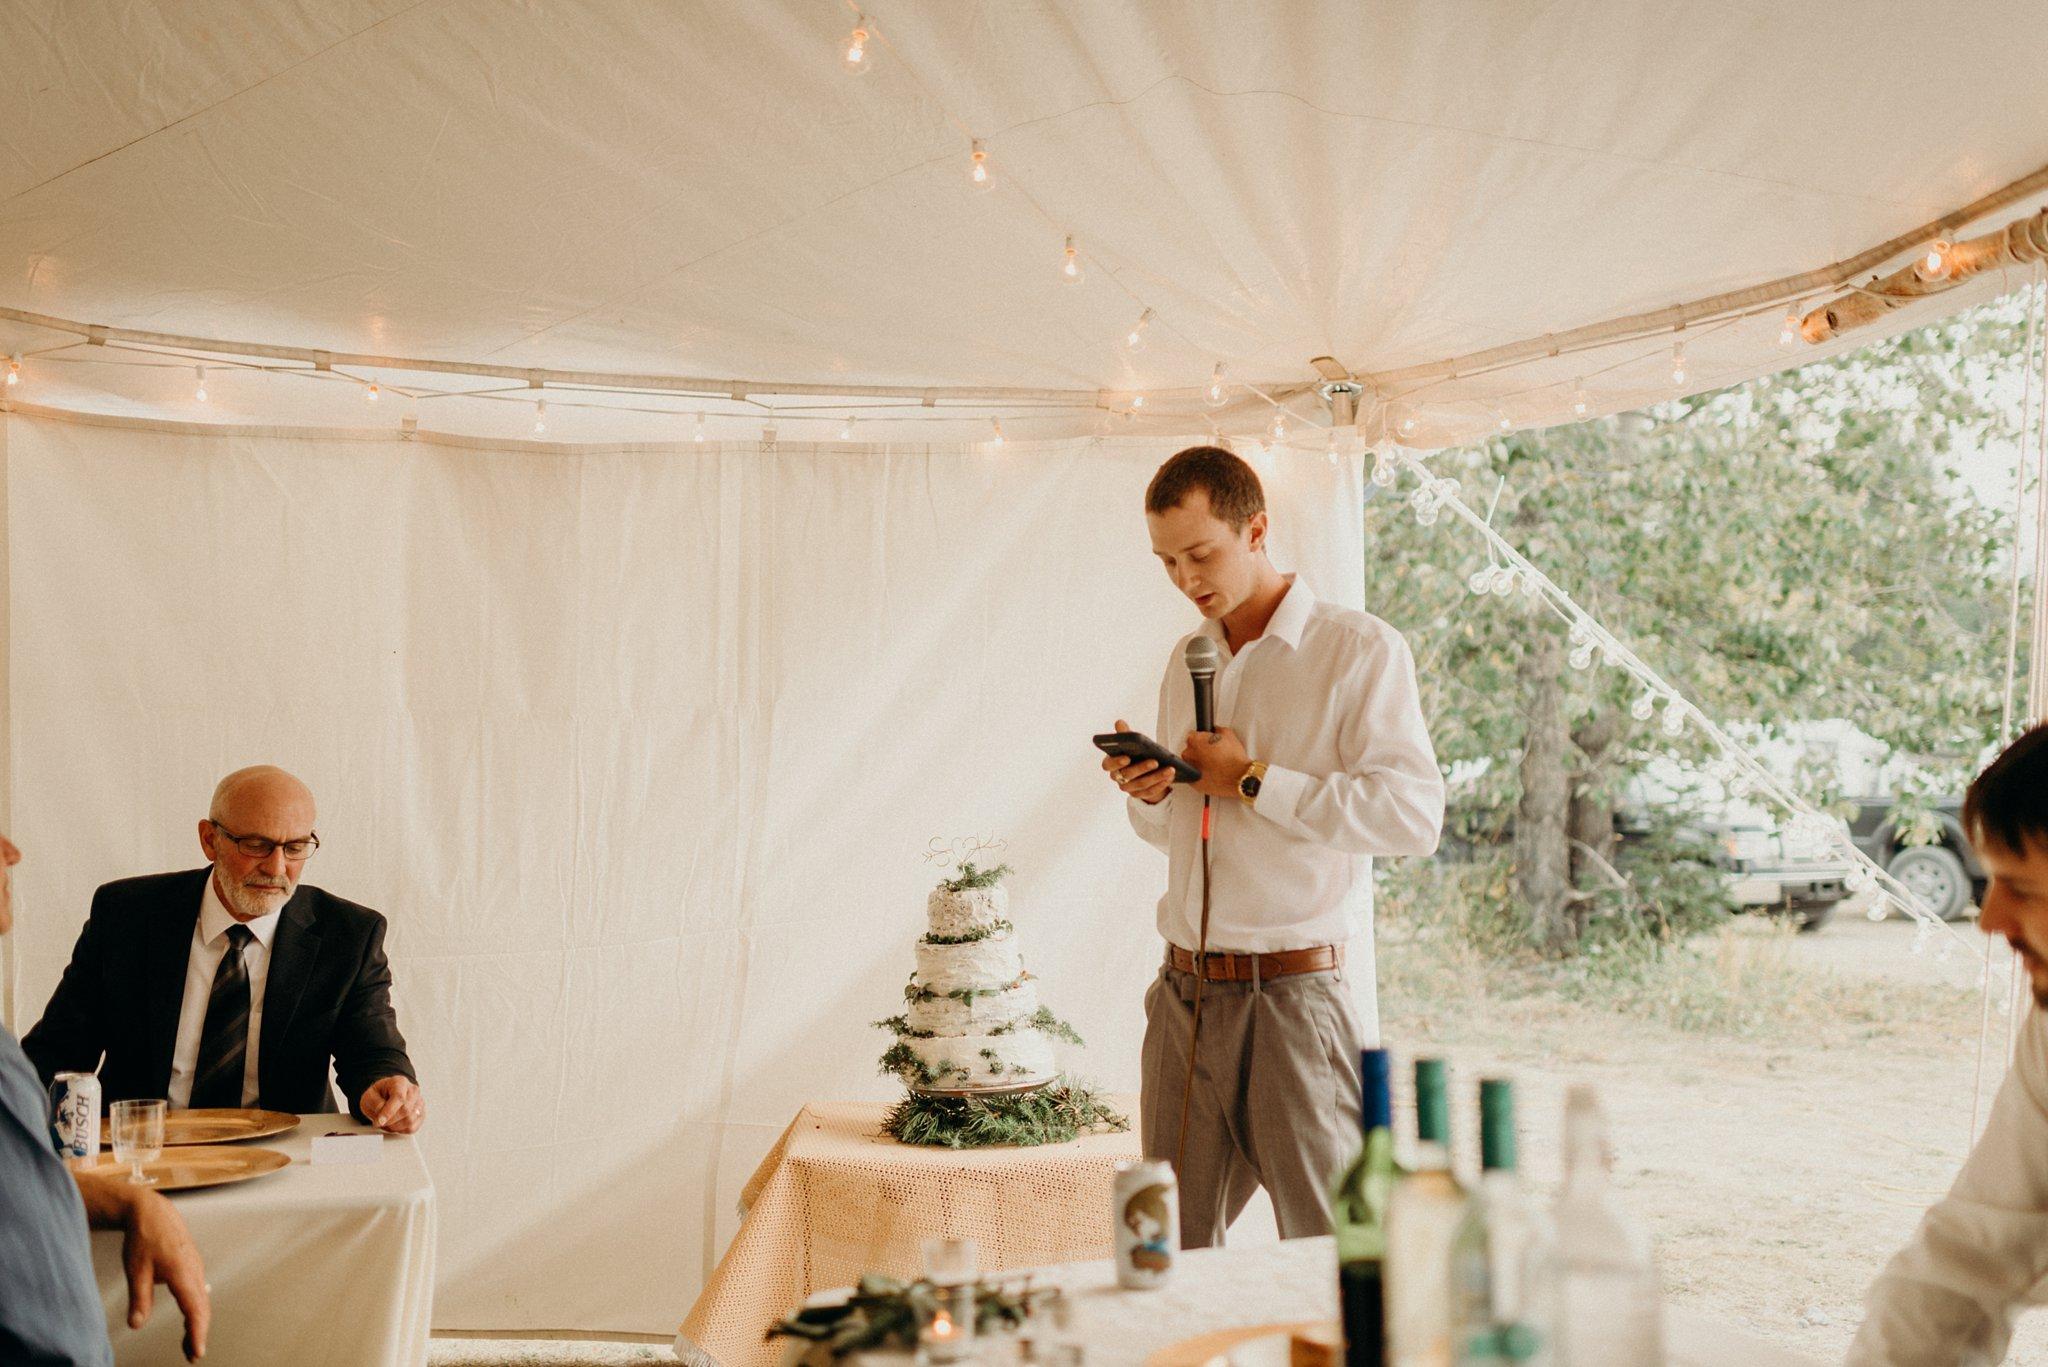 kaihla_tonai_intimate_wedding_elopement_photographer_6783.jpg